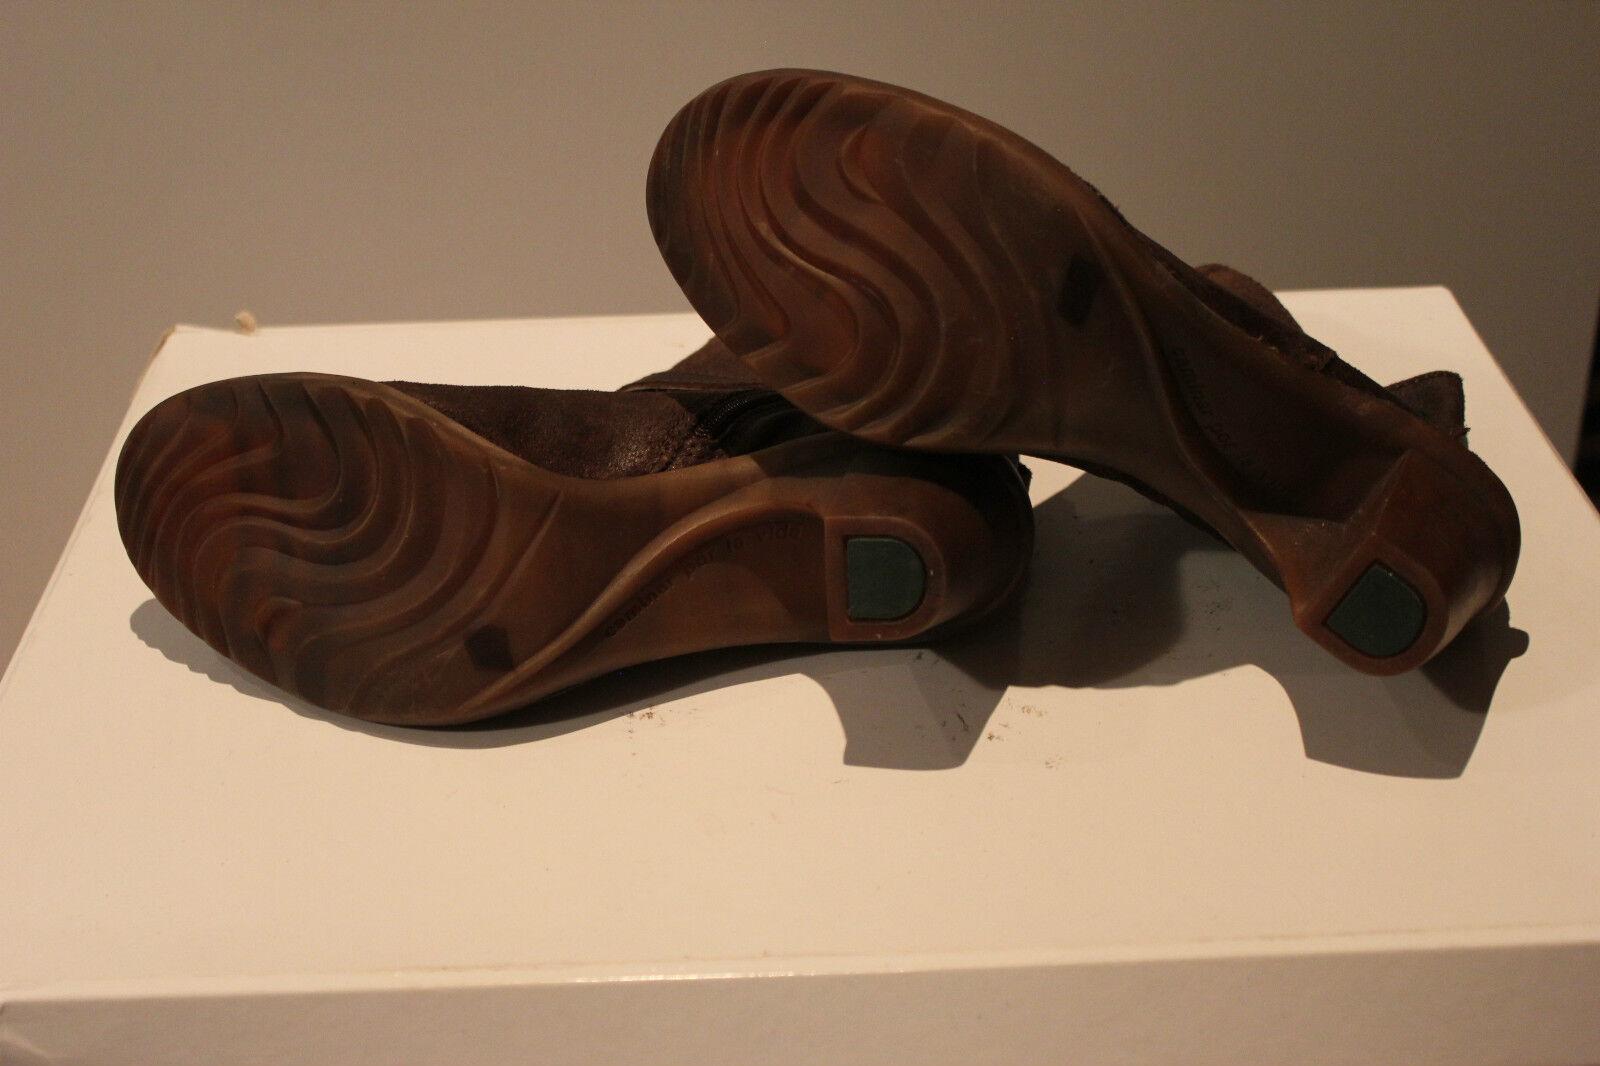 El naturalista super bonito marrón cuero genuino botines, botines, botines, talla 41, impecable 36d3e5